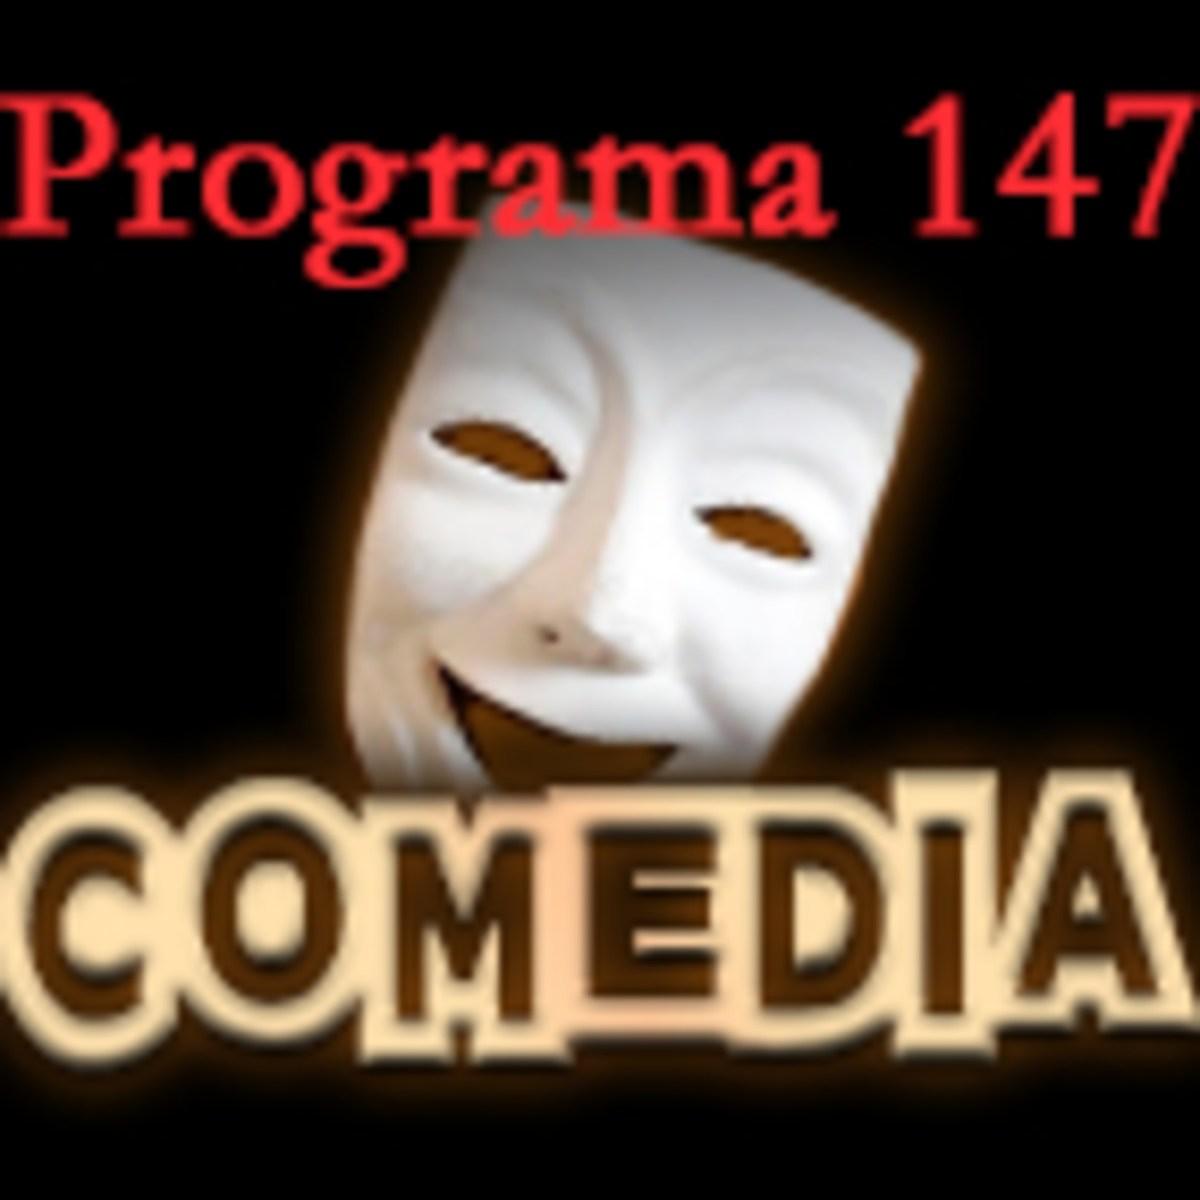 Programa 149. Comedia